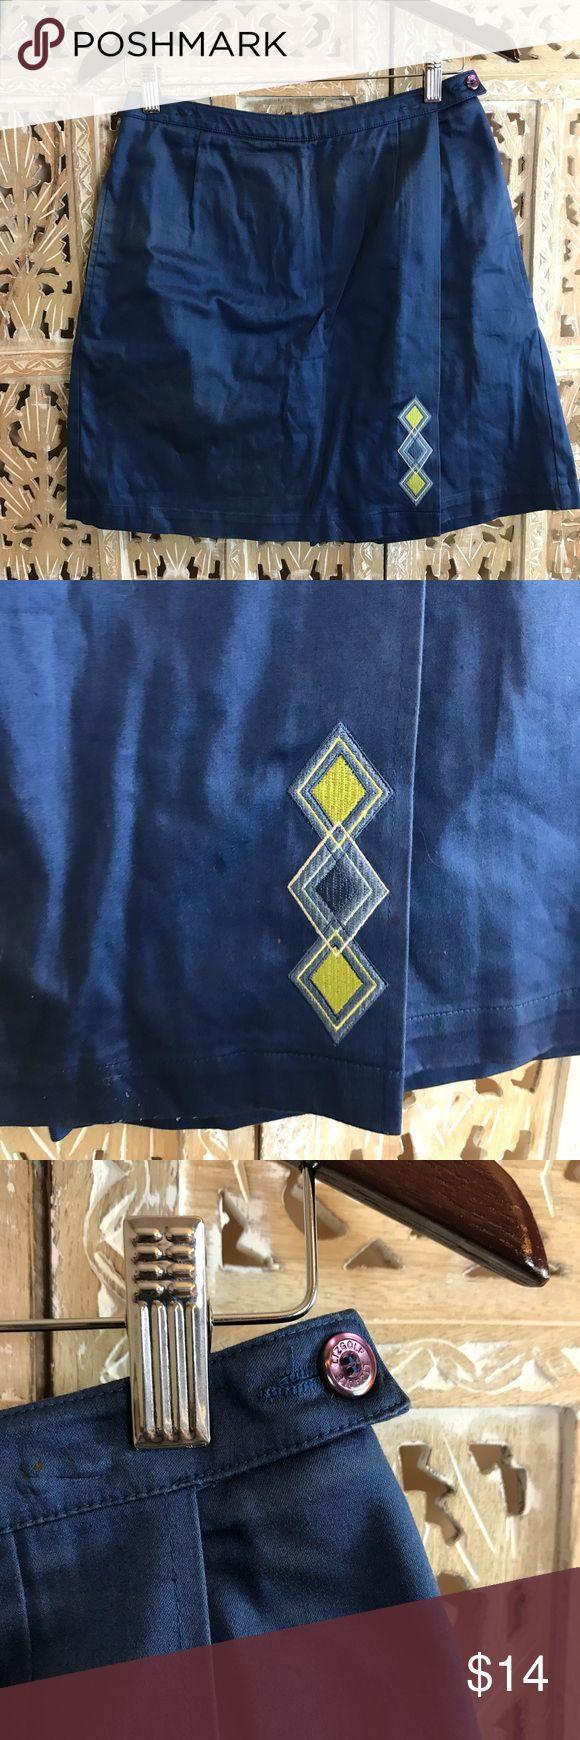 "[Liz Claiborne] skirt golf apparel 🏌️ size 4 [Liz Claiborne] skirt golf apparel 🏌️ size 4. The Liz gold label. Beautiful blue color. Waist width about 14"". Skort length 19"". Excellent quality 98% Cotton 2% Lycra. Liz Claiborne Shorts Skorts"